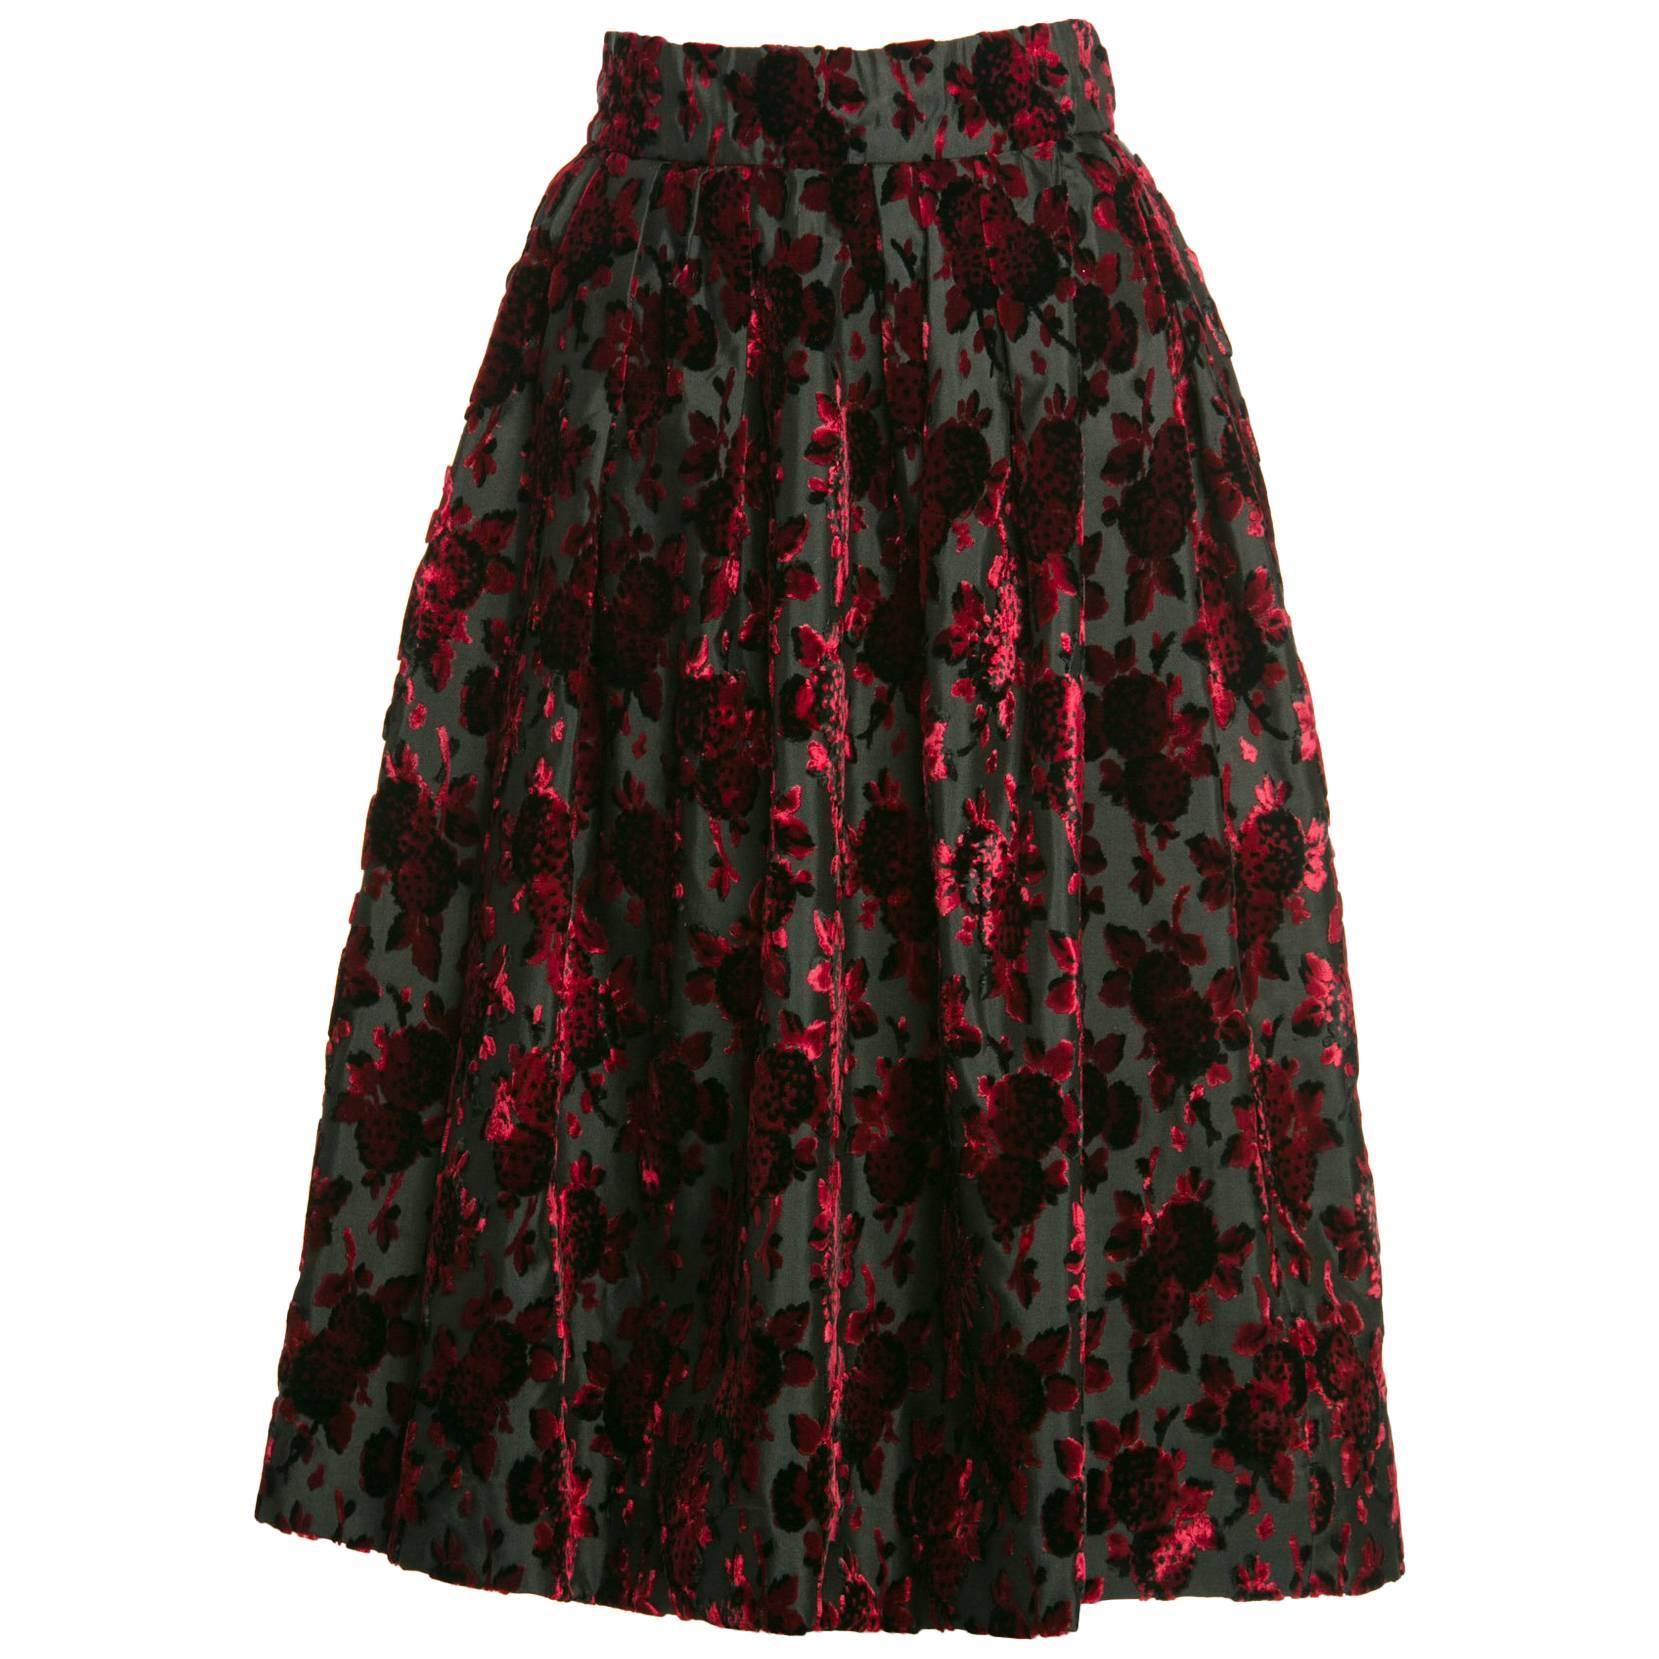 1960s Christian Dior Marc Bohan Demi Couture Red Velvet Florals Silk  Skirt